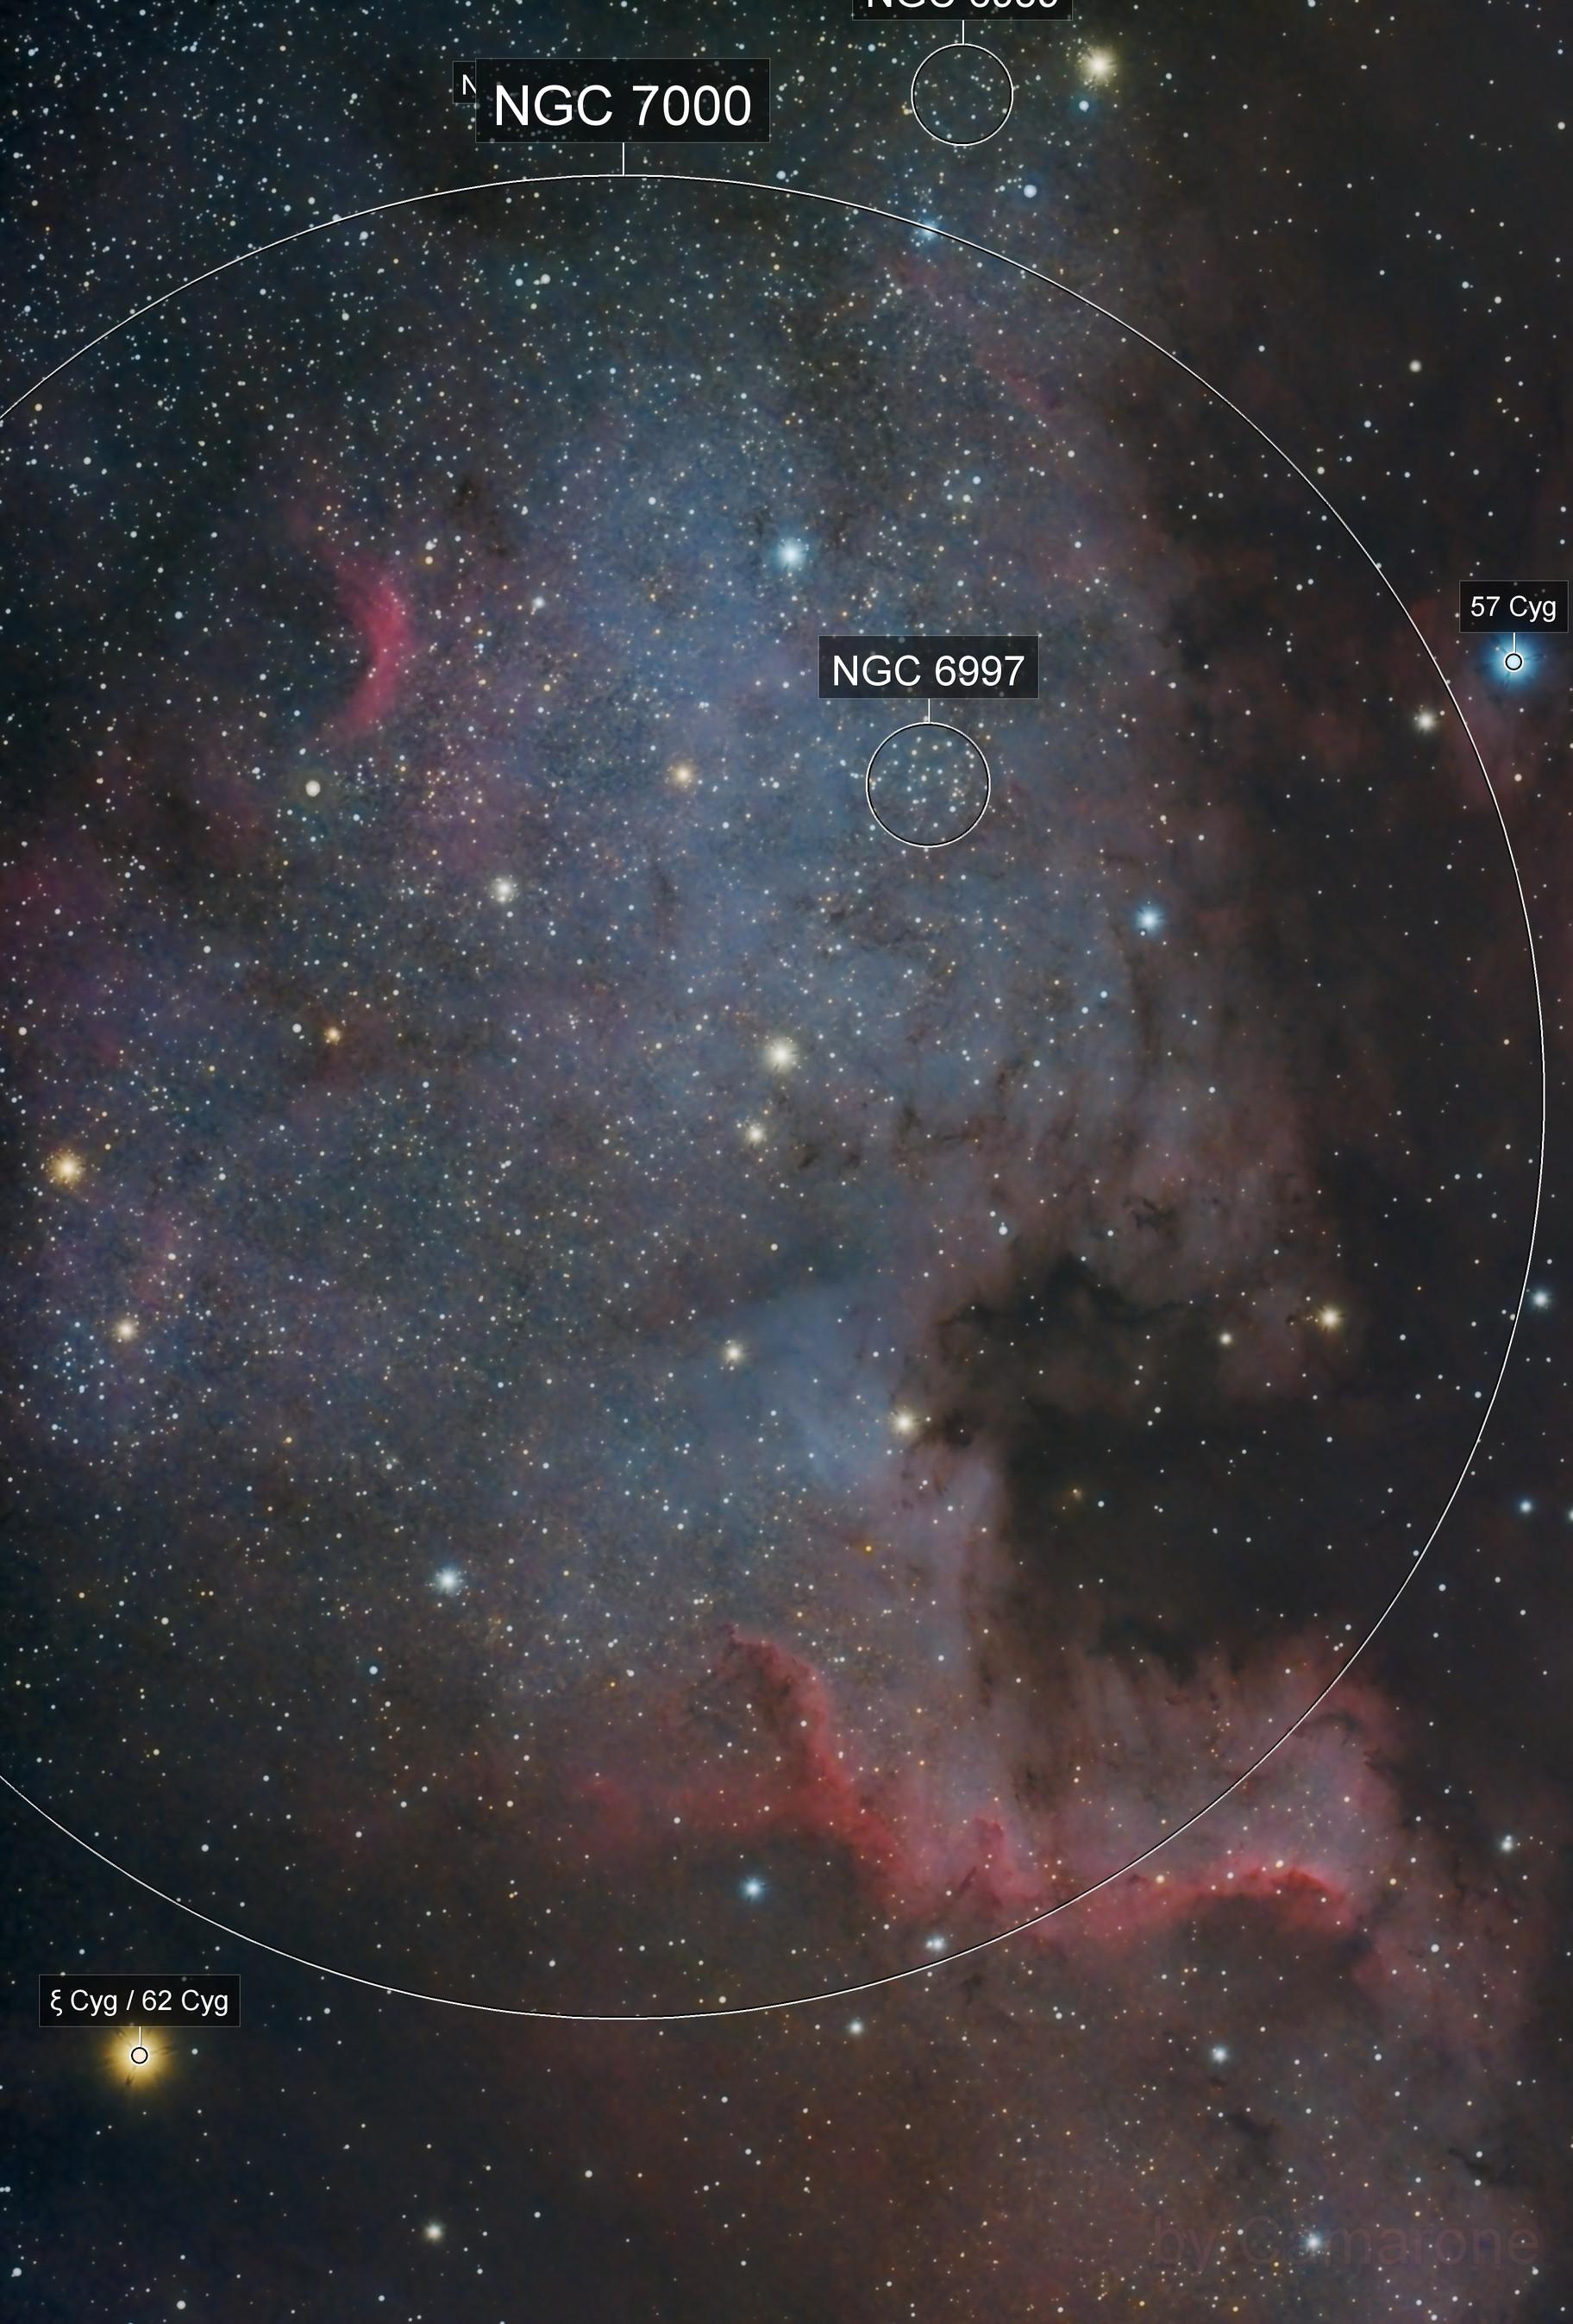 NGC7000 The Cygnus Wall. Summer is coming...